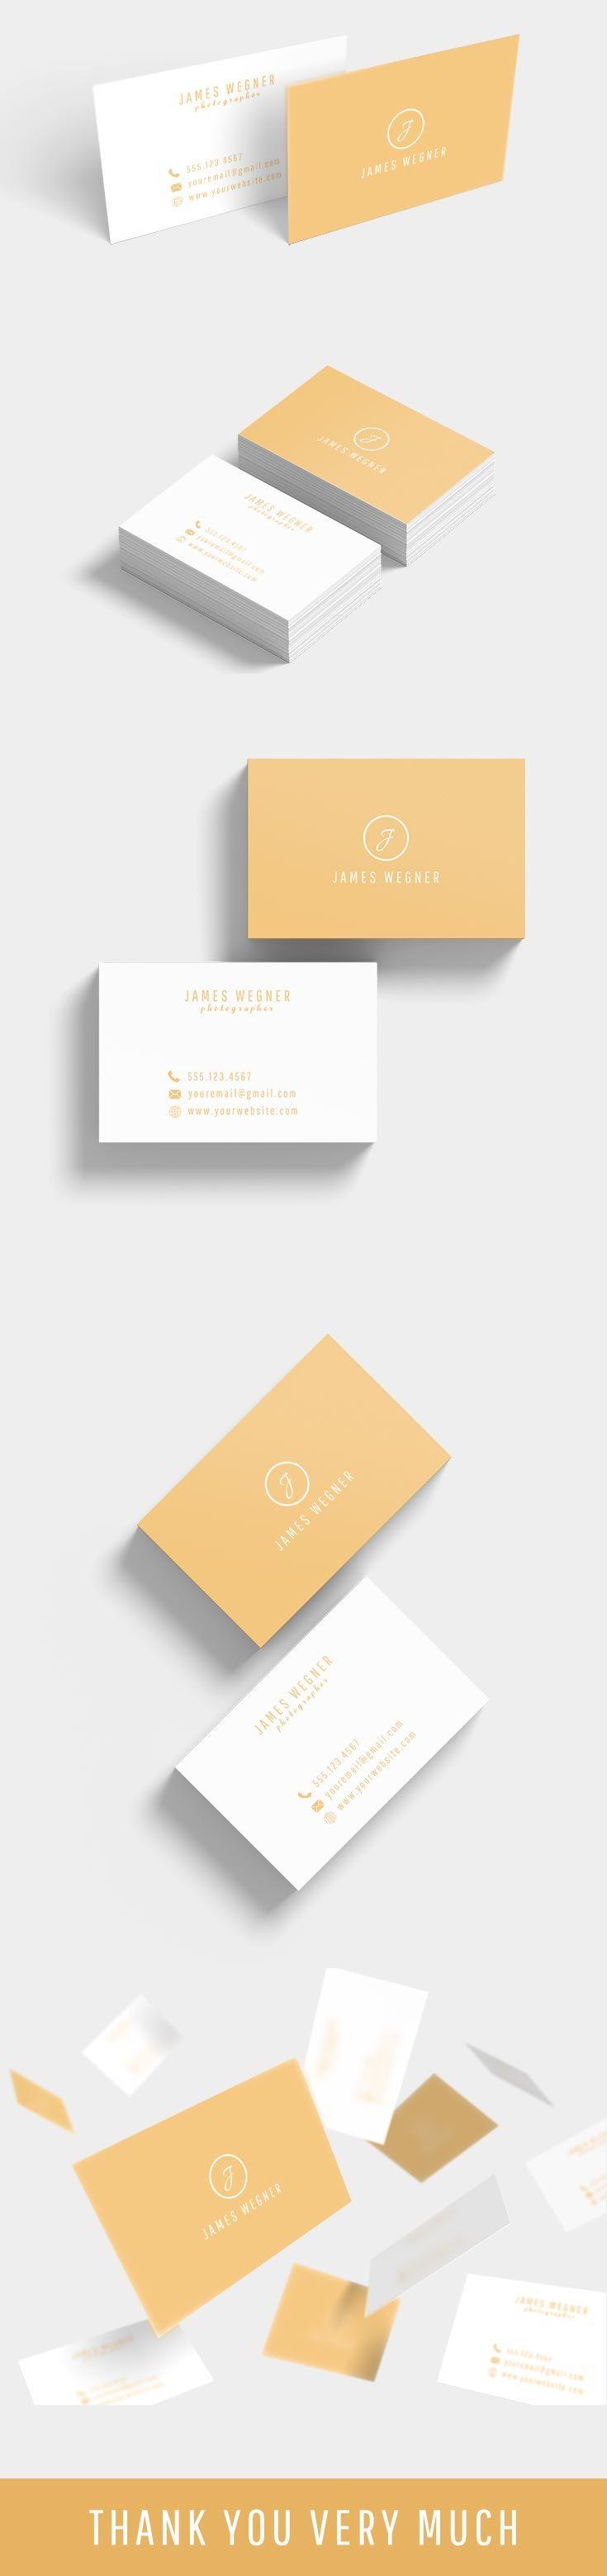 Free Modern Business Card Ver 2